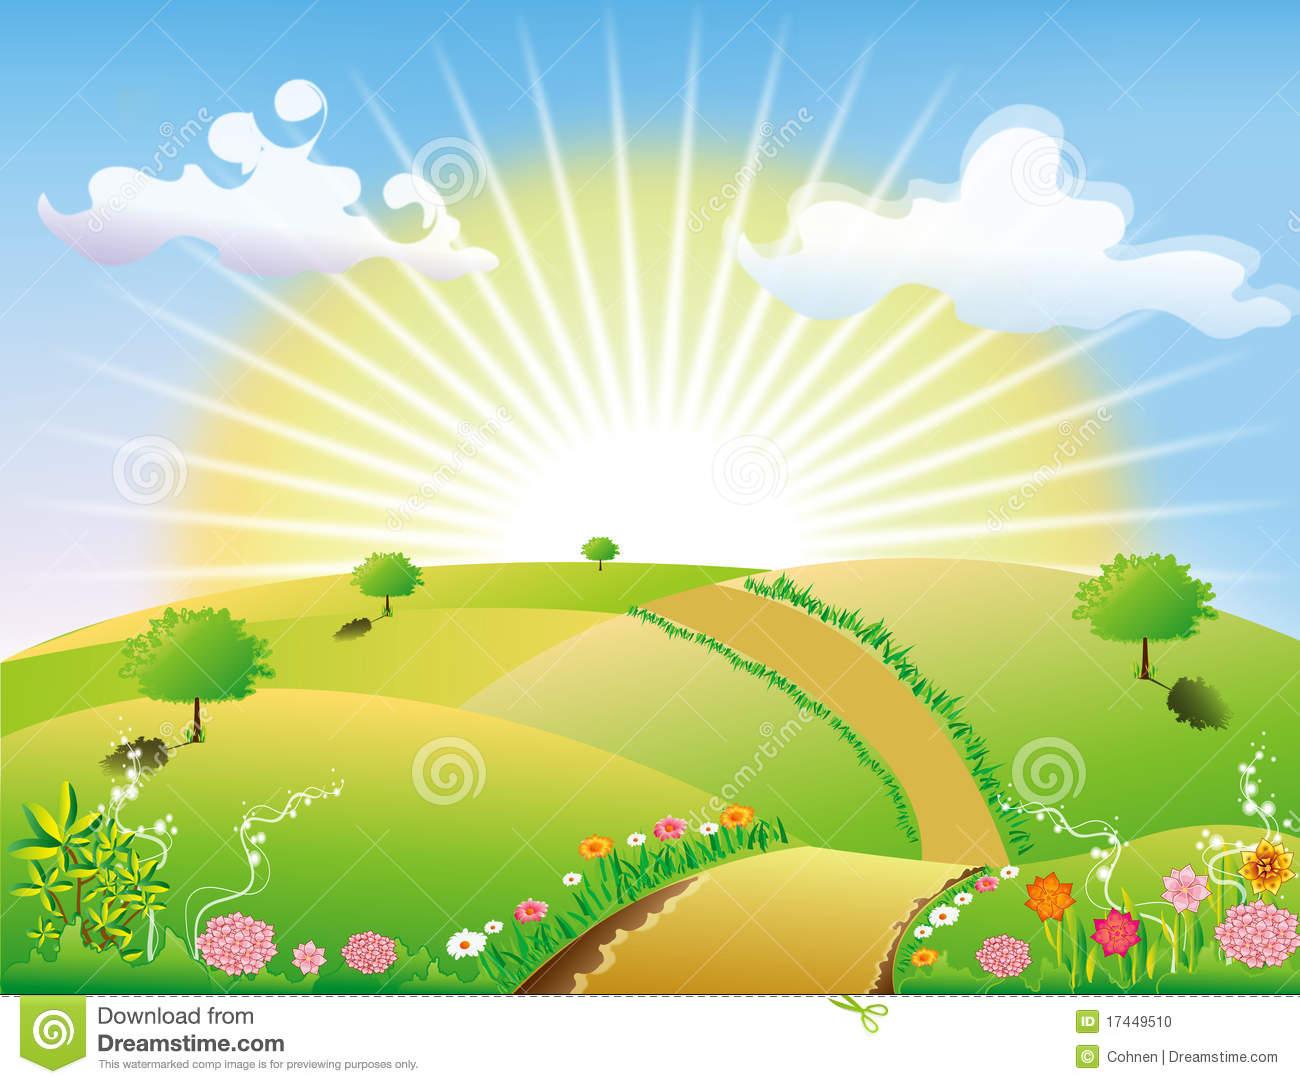 Scenery clipart sun sky #2